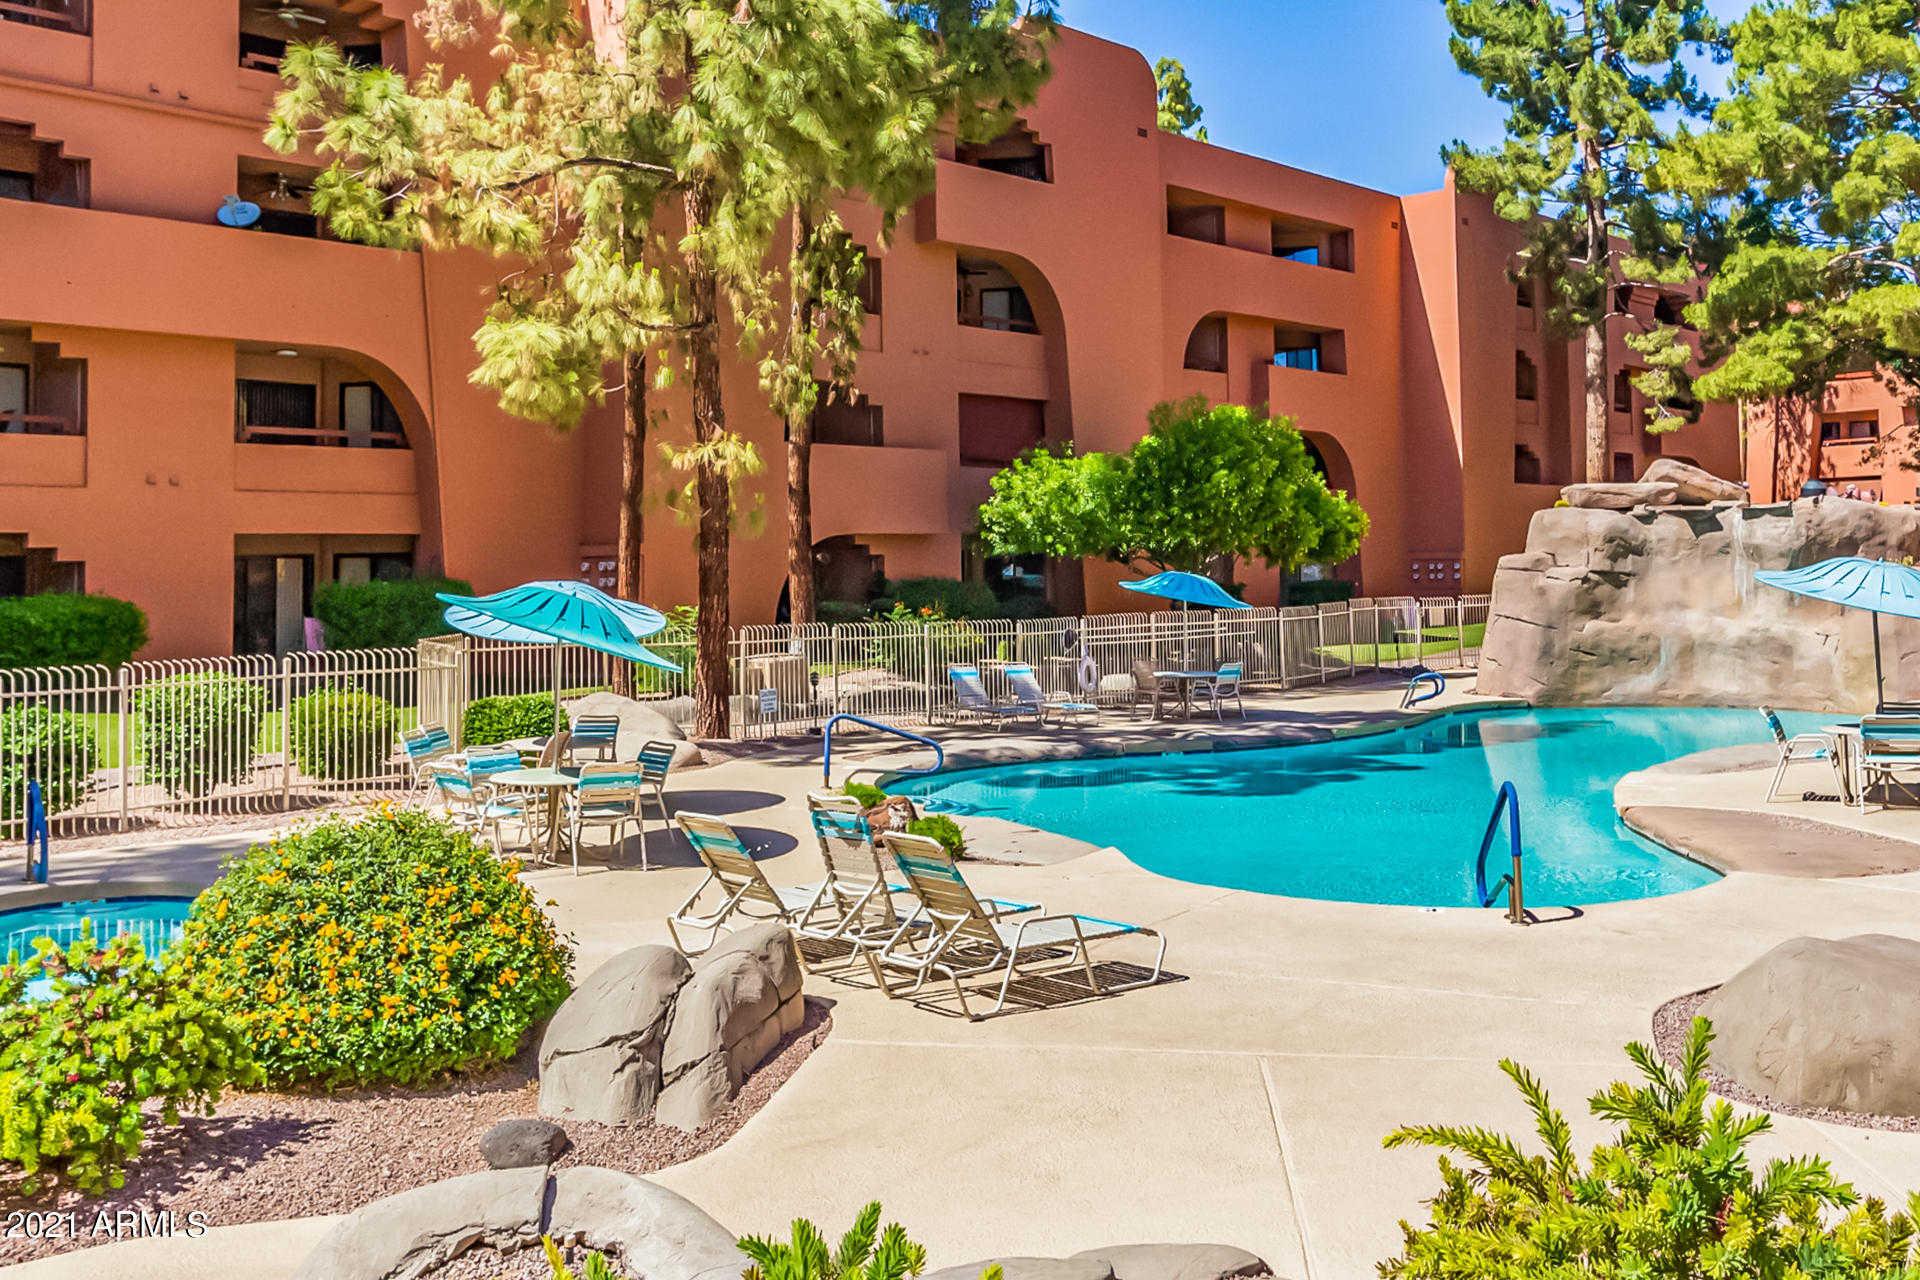 $269,900 - 1Br/1Ba -  for Sale in Anasazi Village Condominiums, Phoenix